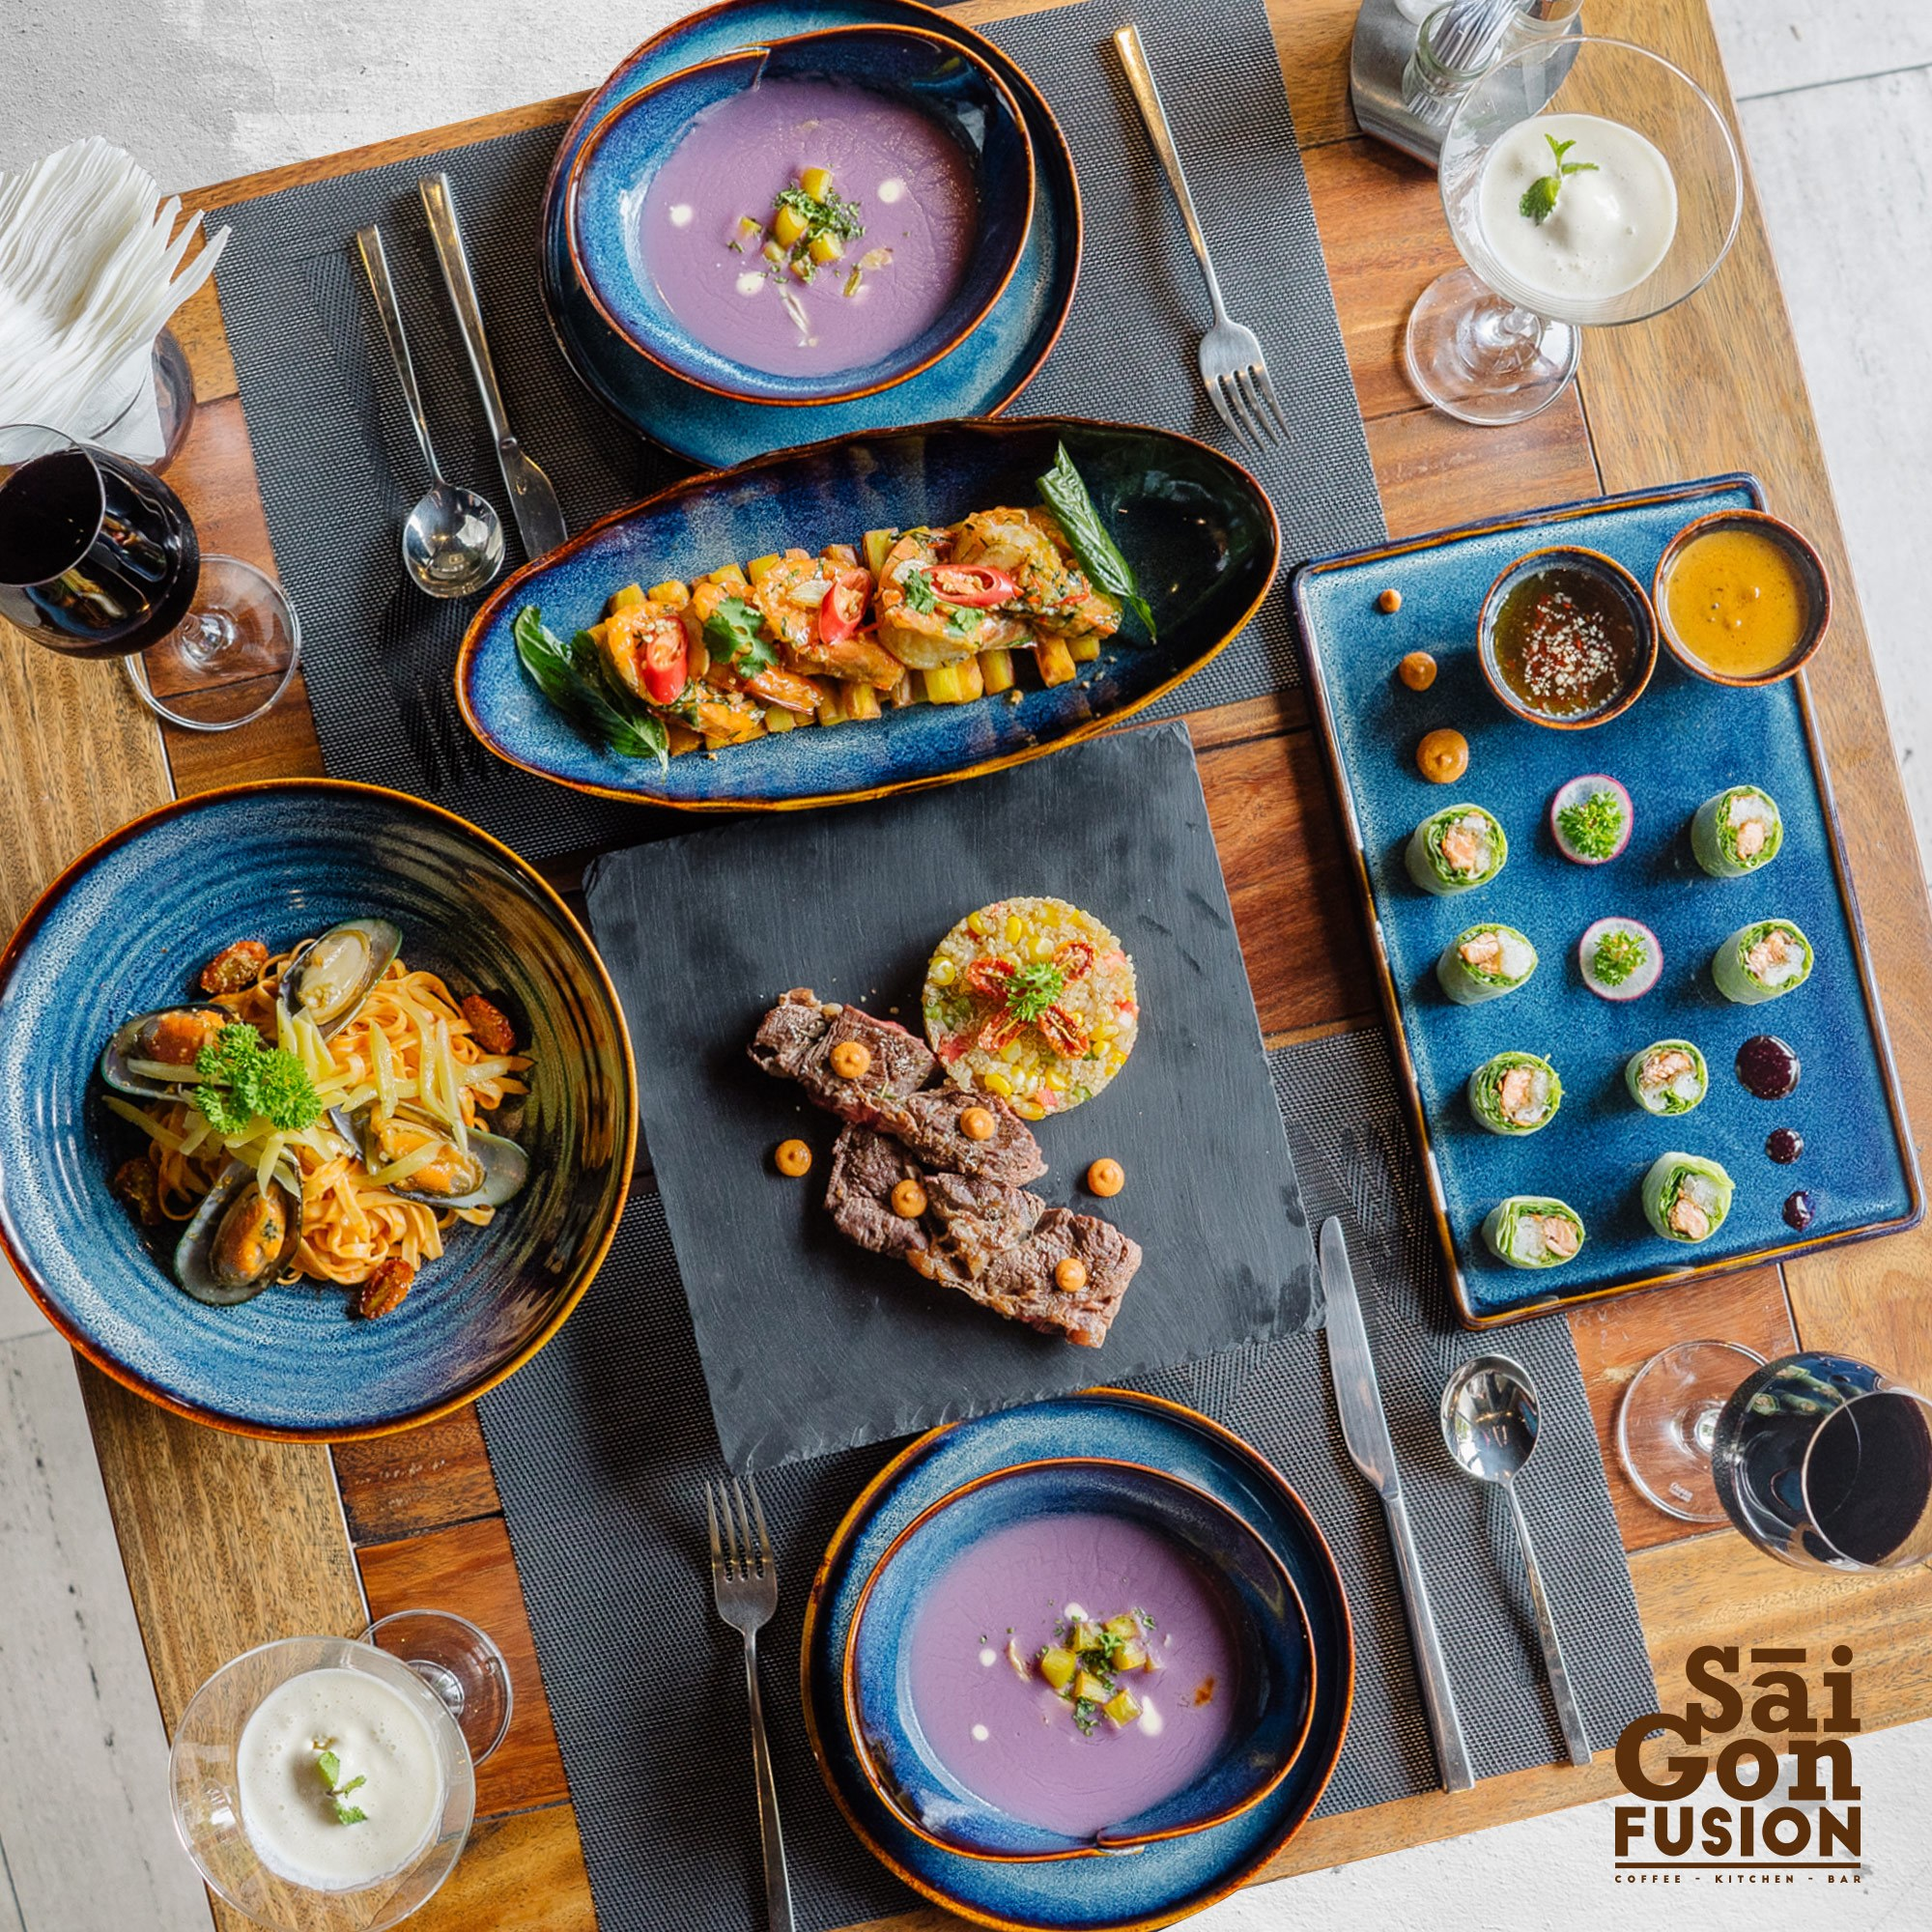 Saigon-fusion-kitchen-bar